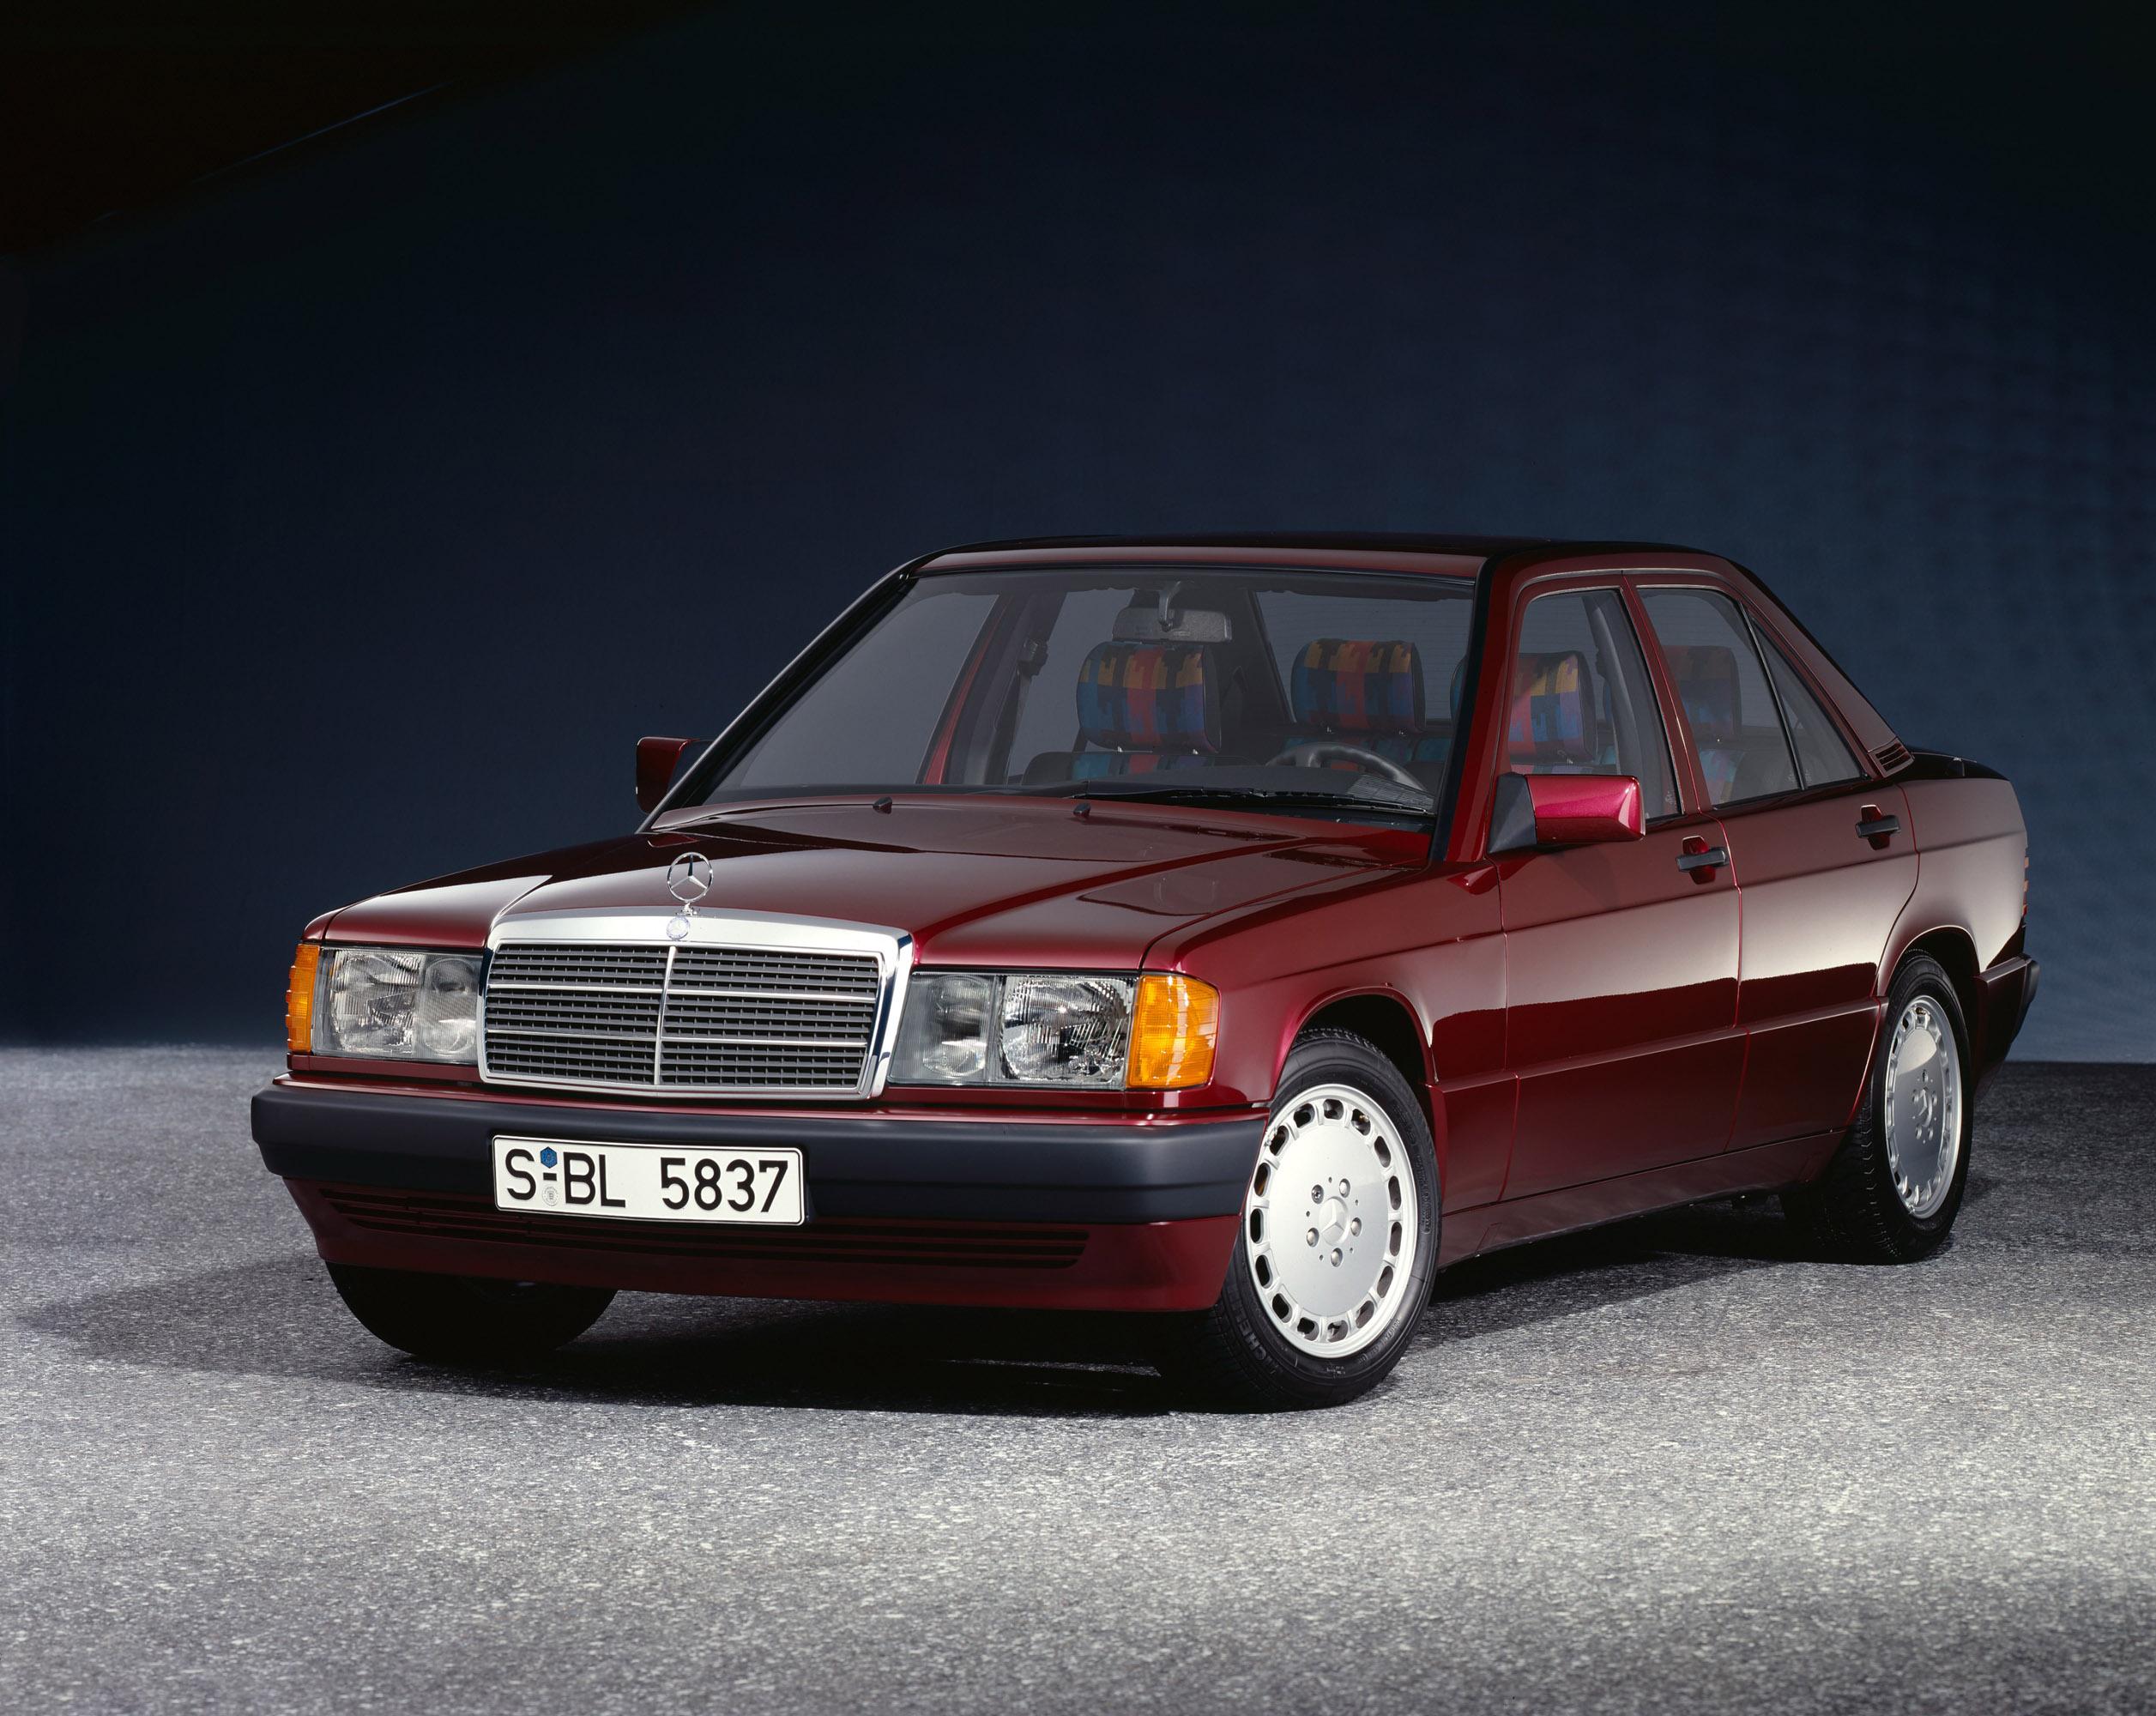 Mercedes-Benz 190 W201 series photo #1